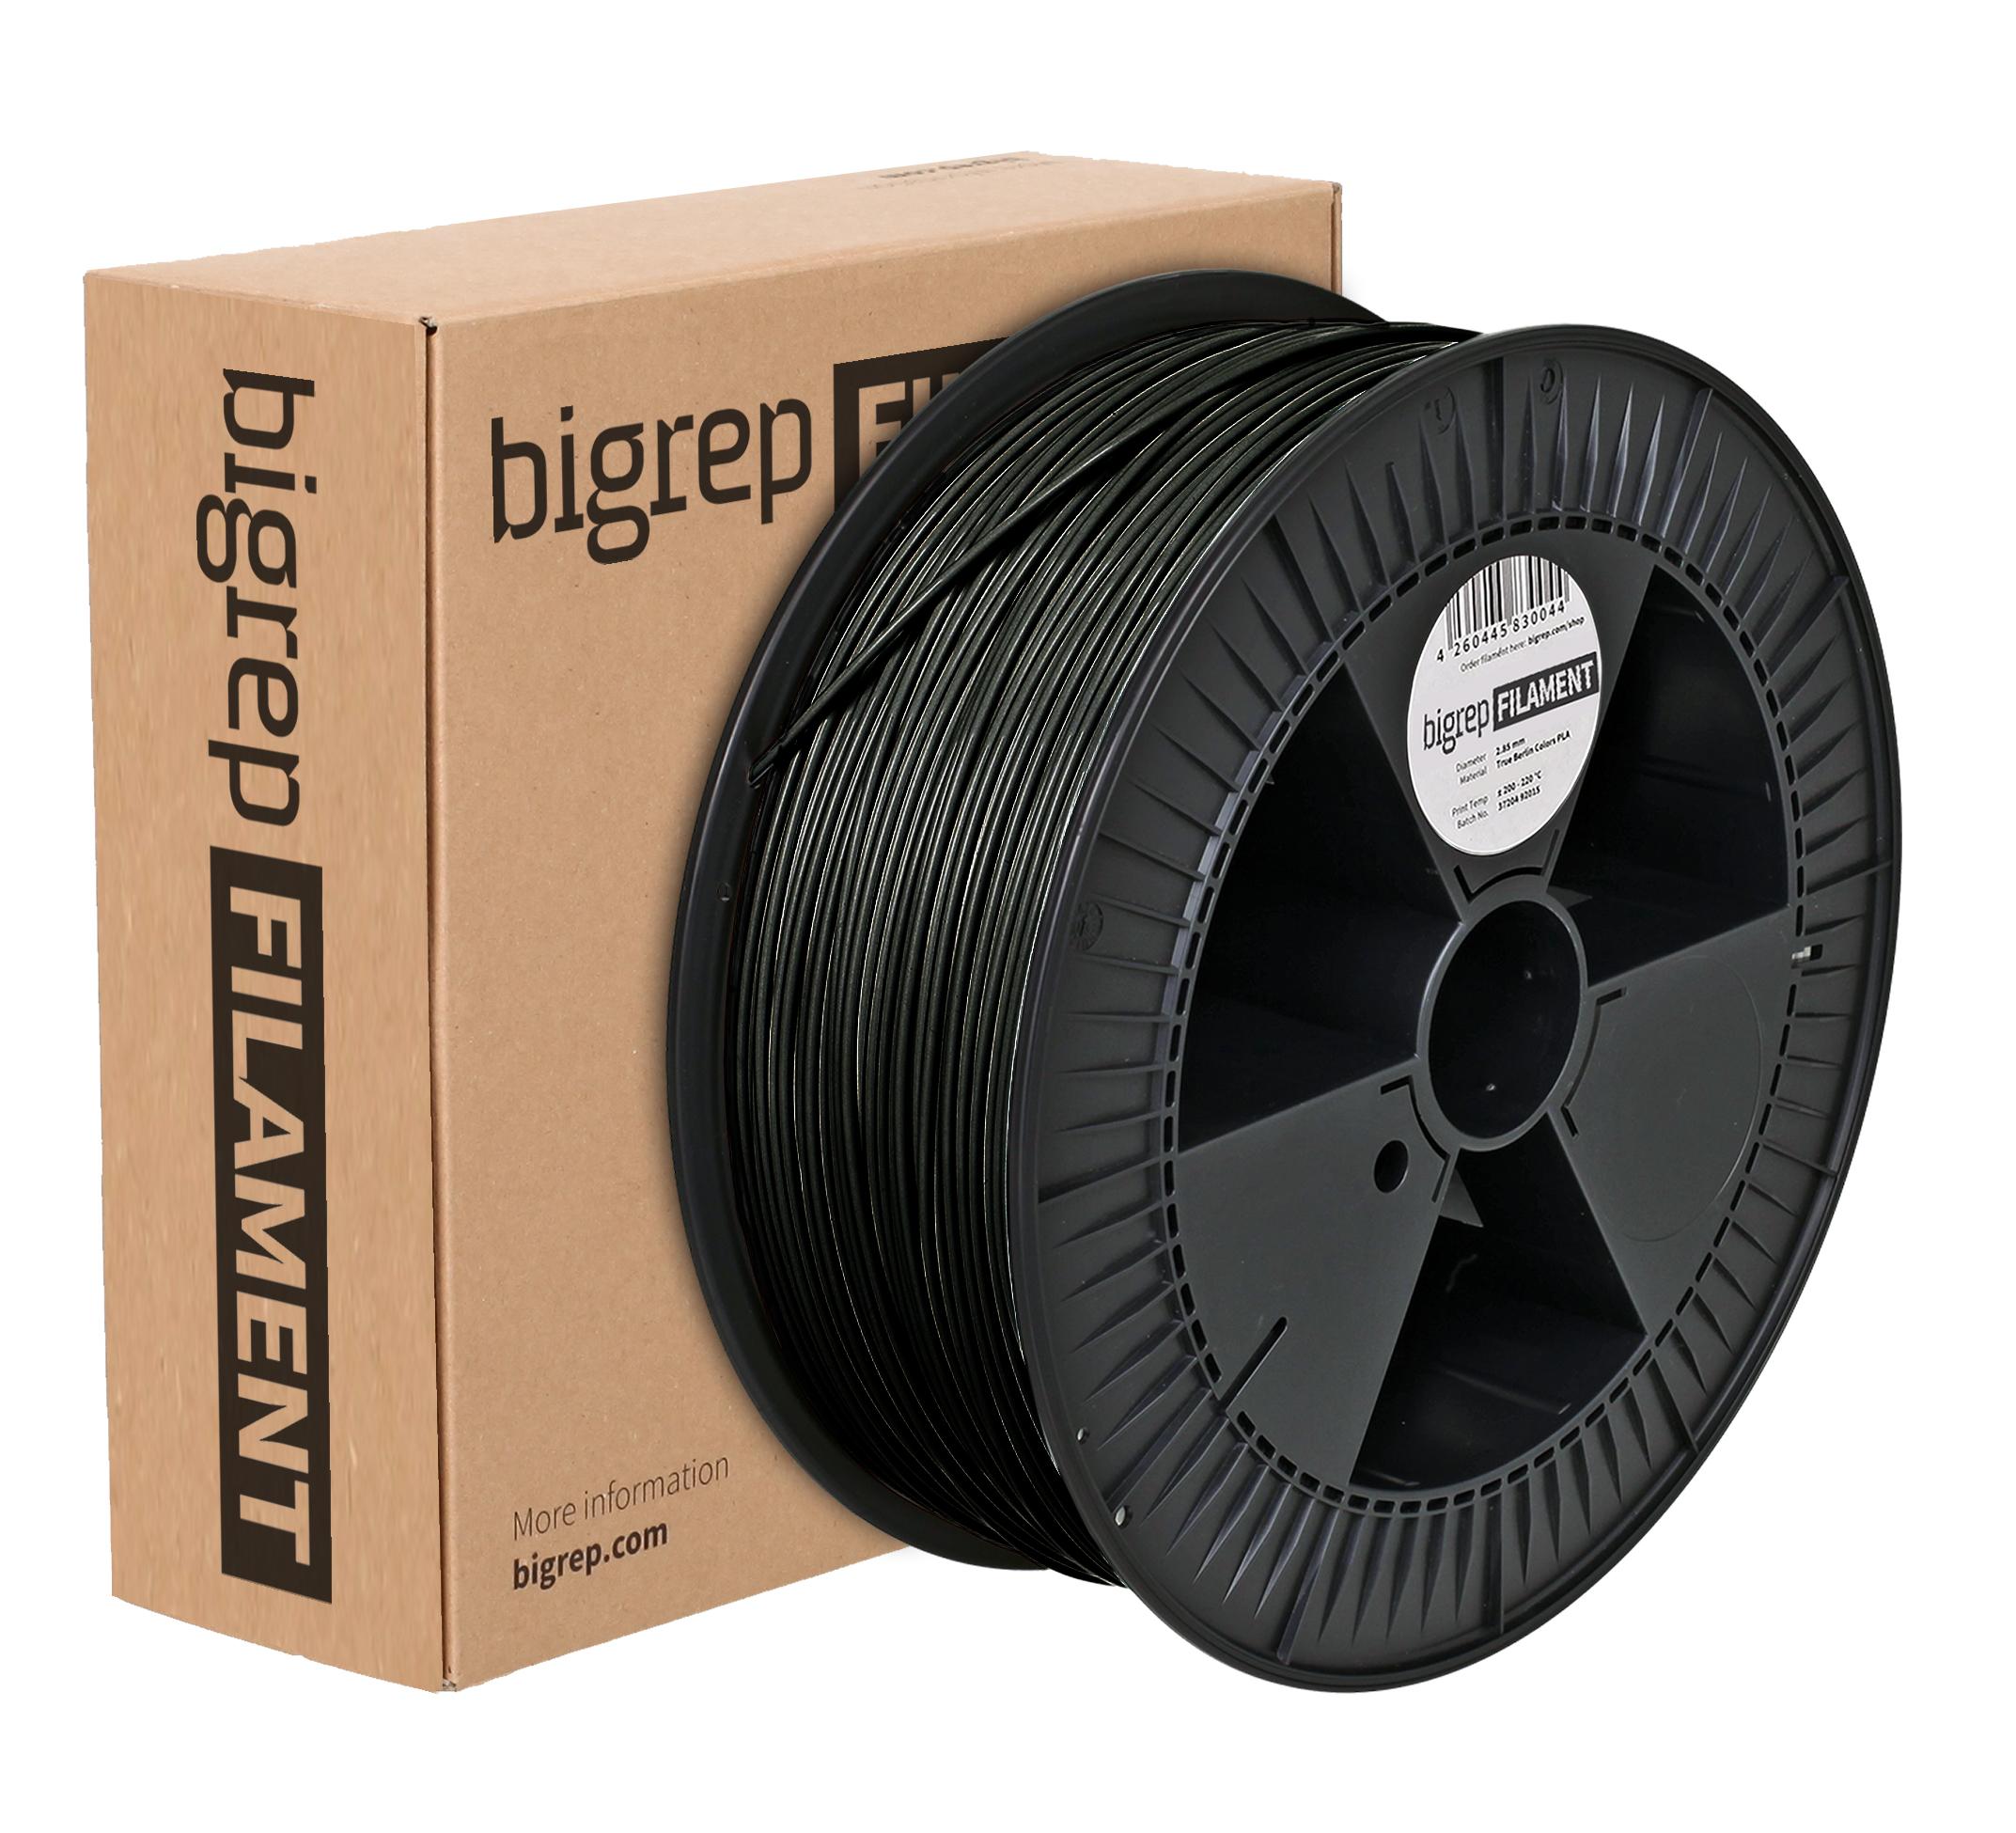 bigrep stellt flexibles filament pro flex vor. Black Bedroom Furniture Sets. Home Design Ideas